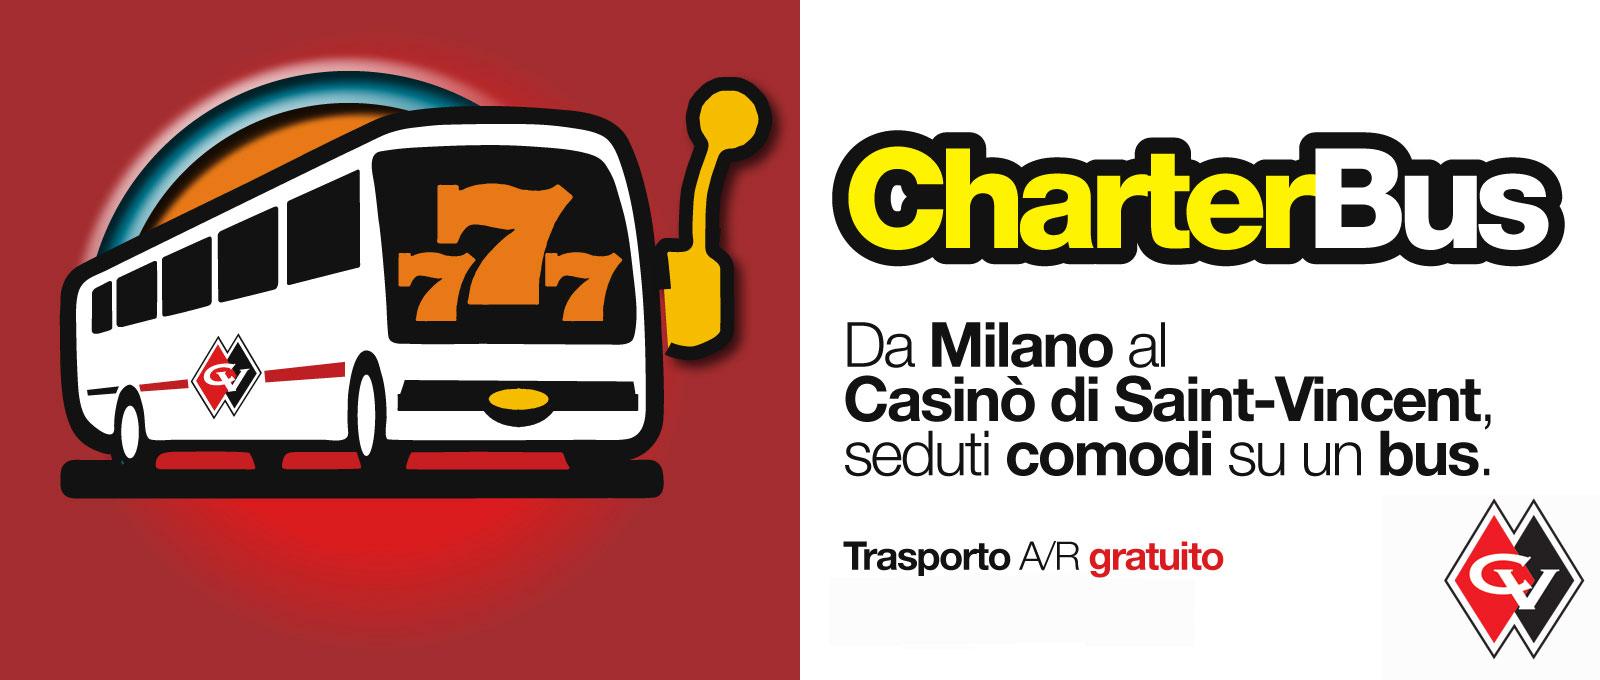 CHARTER BUS DA MILANO